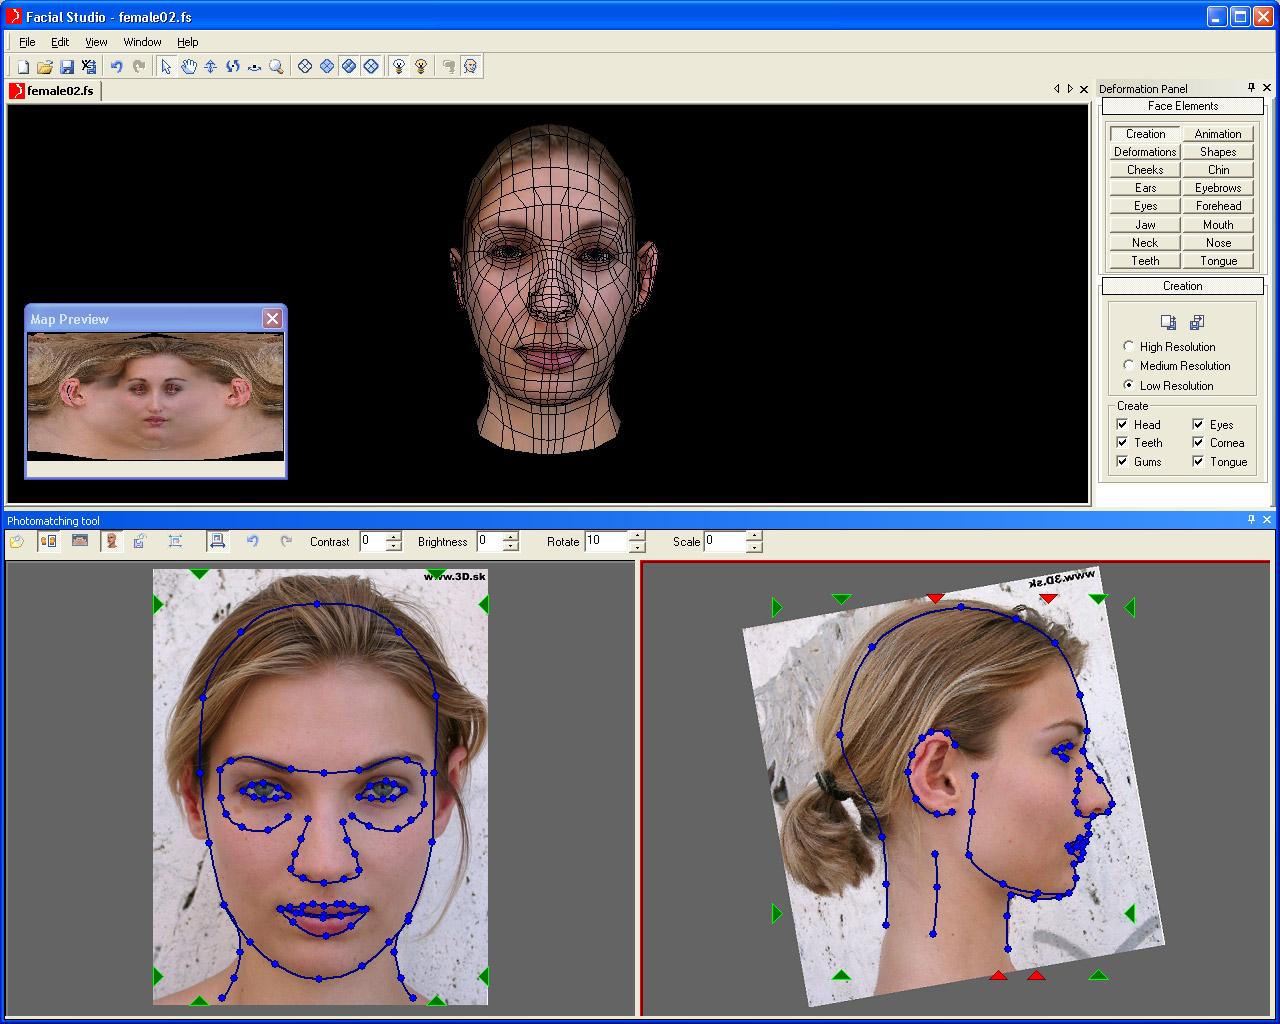 Facial Studio for Windows 2.0